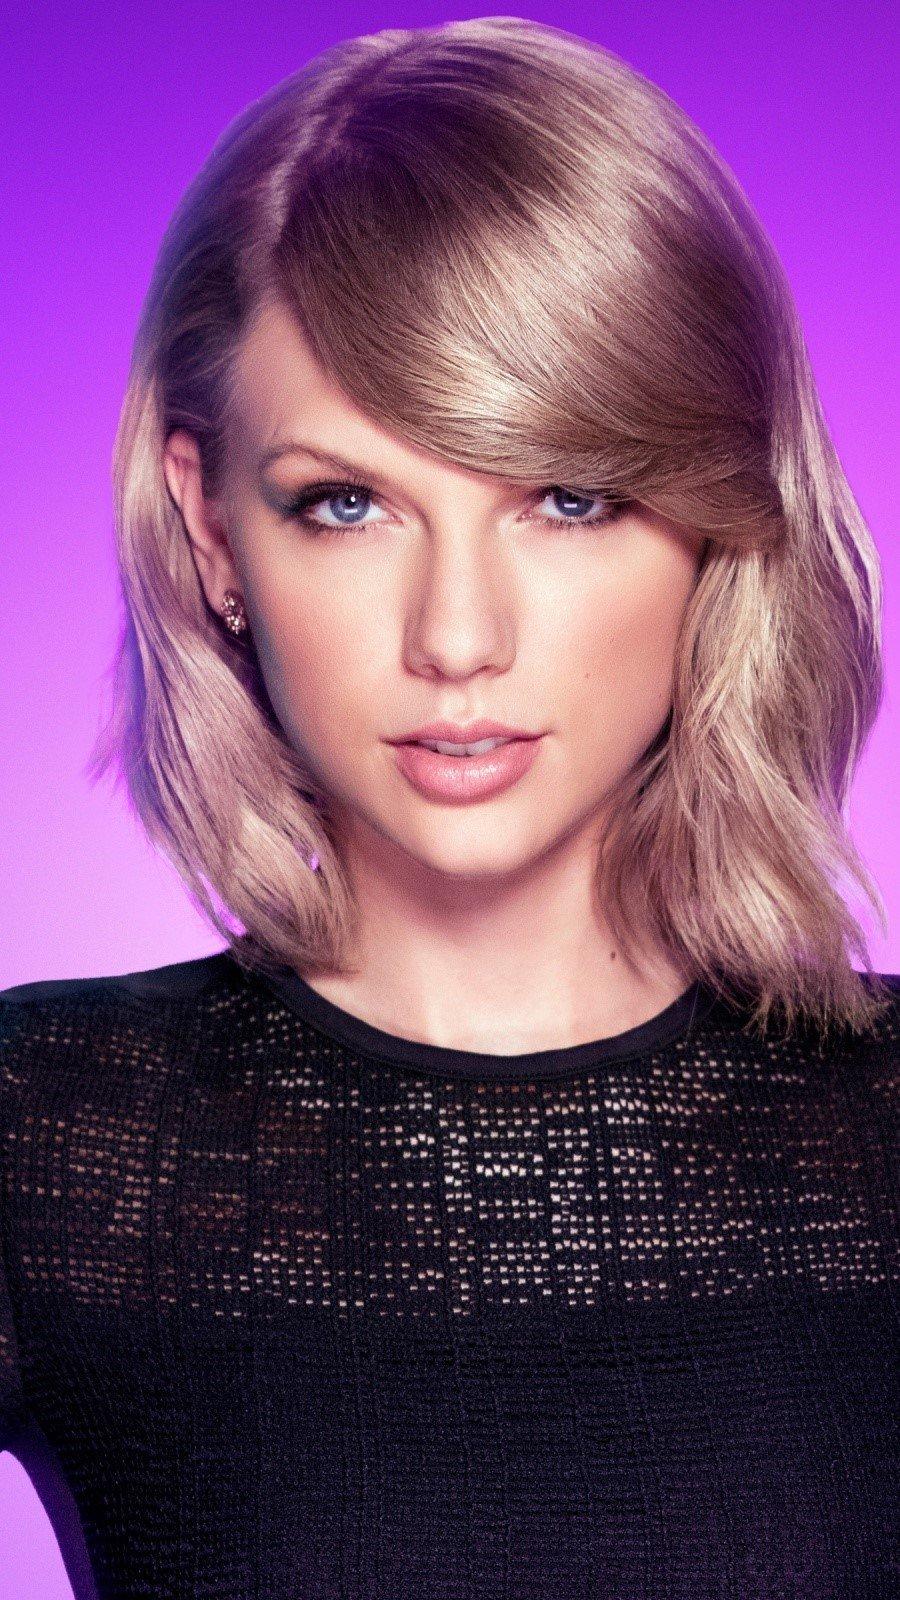 Wallpaper Taylor Swift for 1989 Vertical